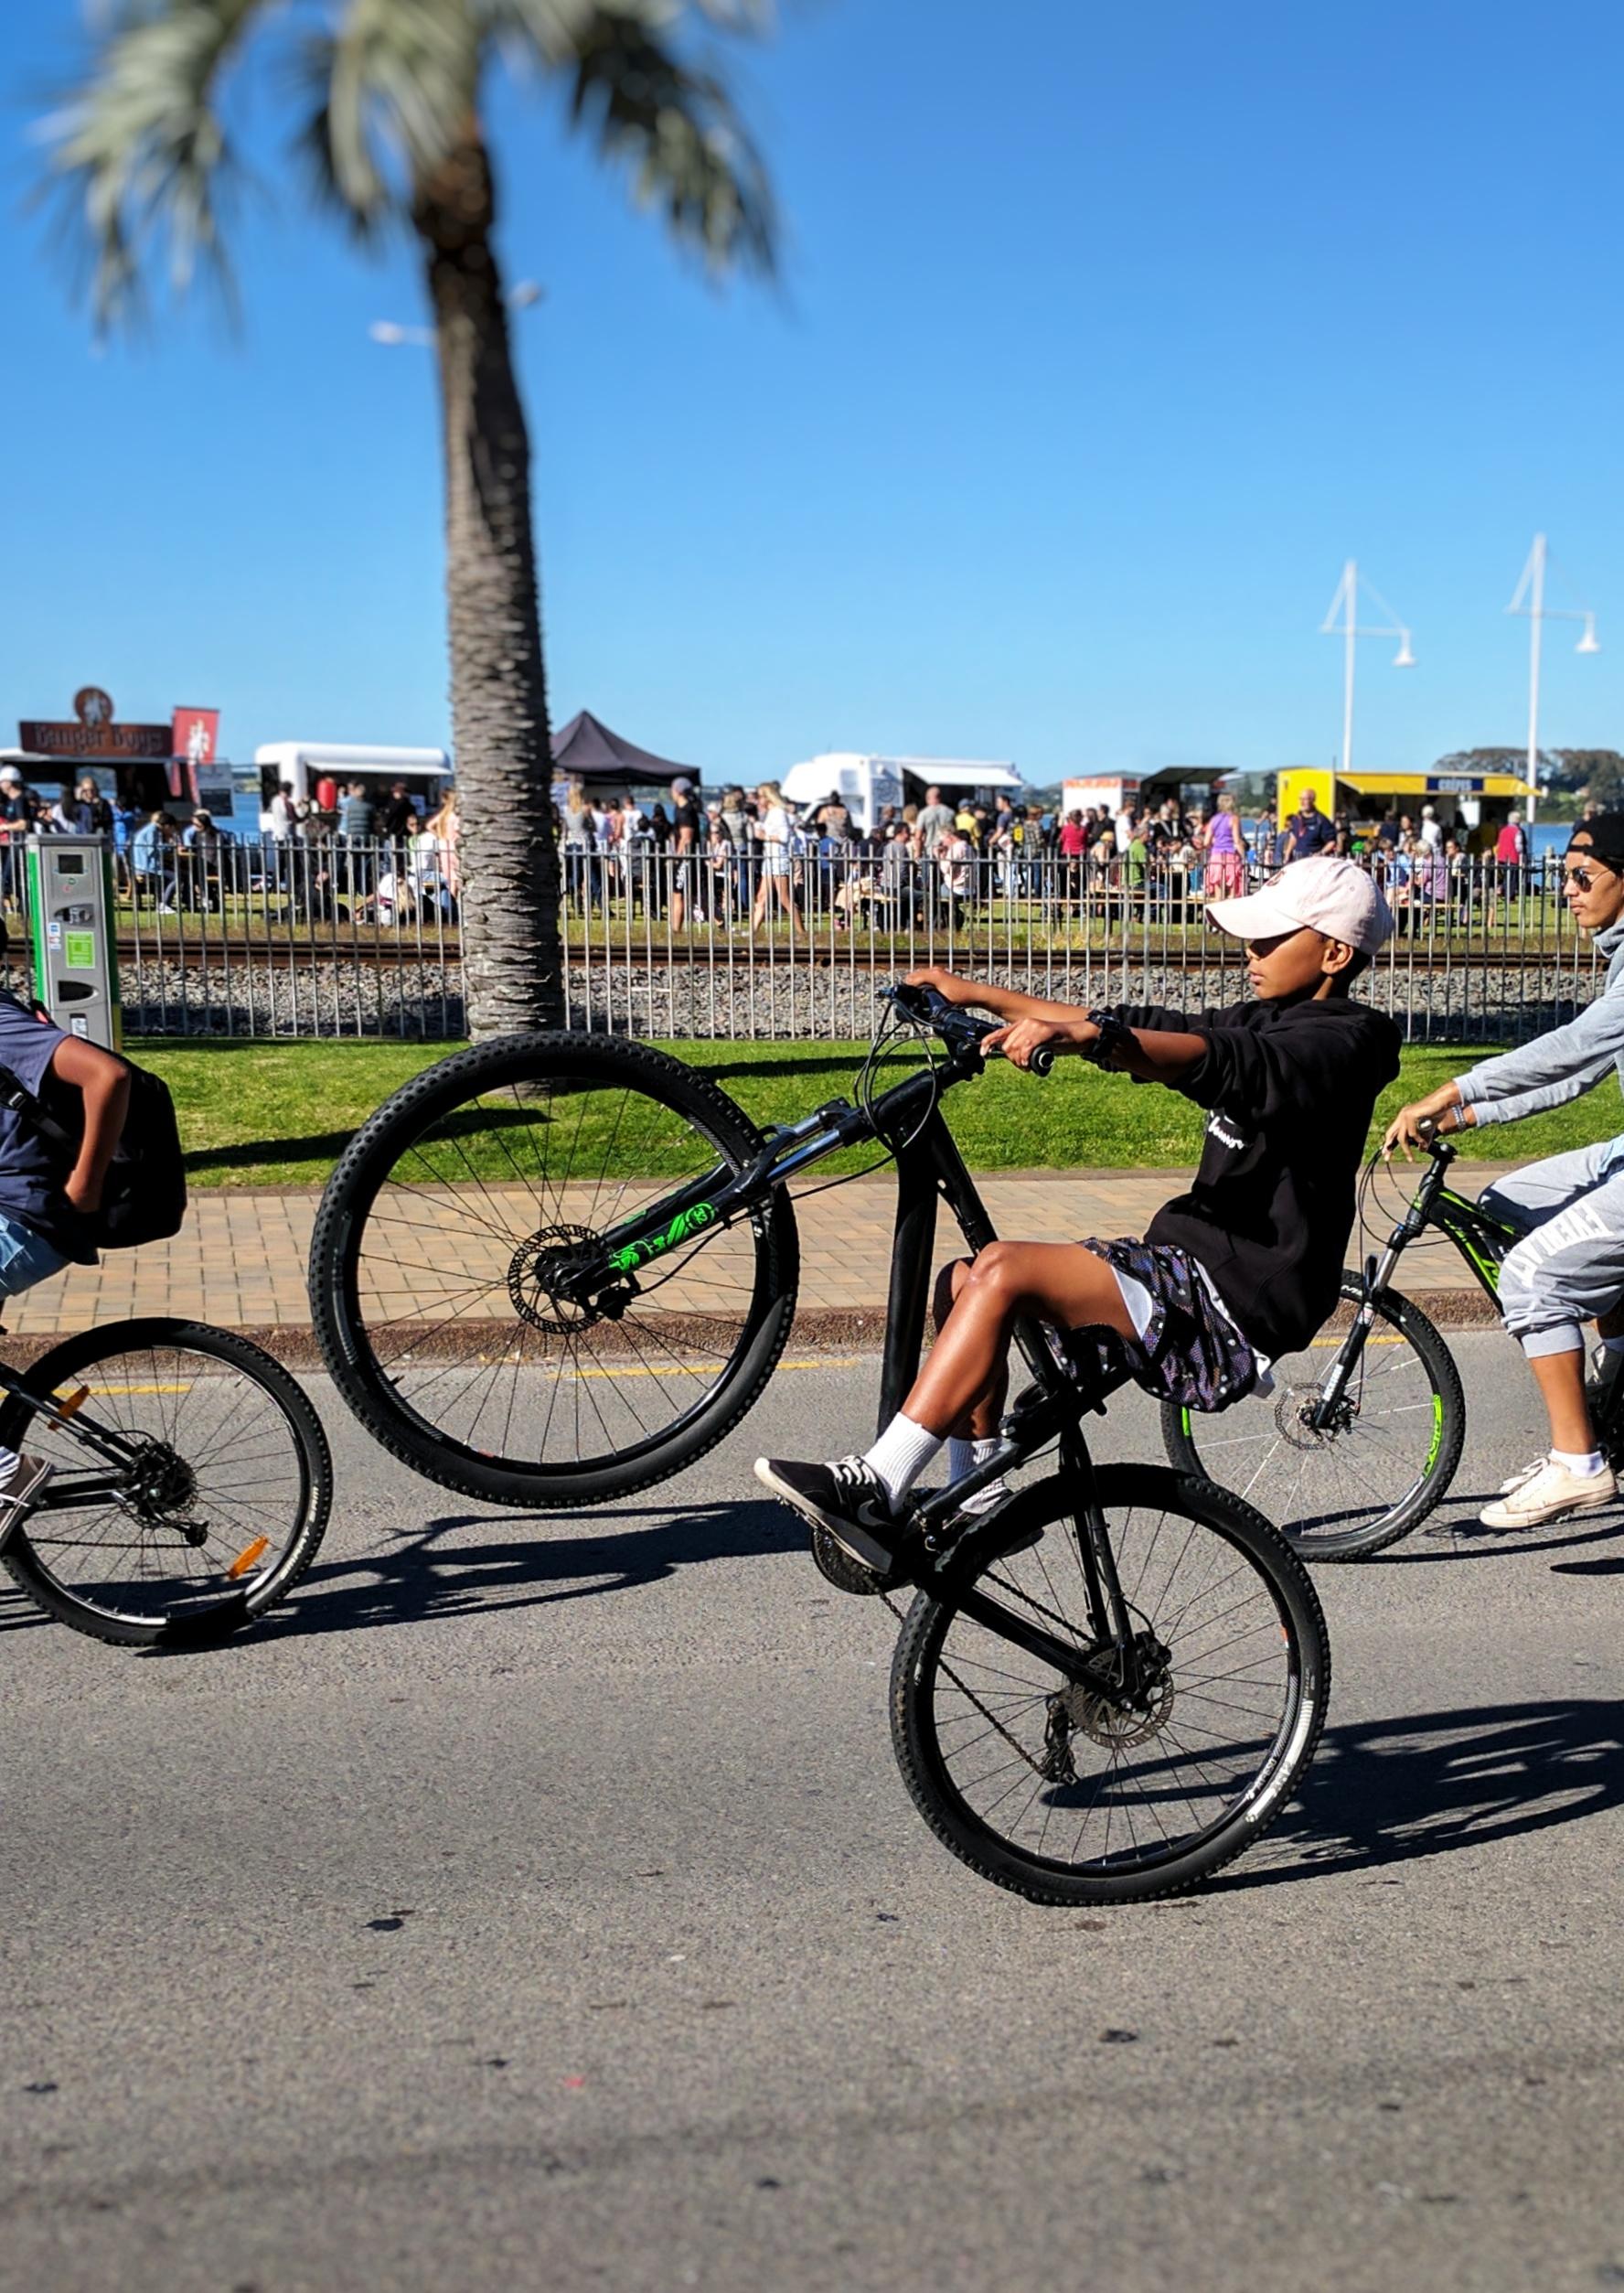 Kid doing a wheelie on the Tauranga waterfront